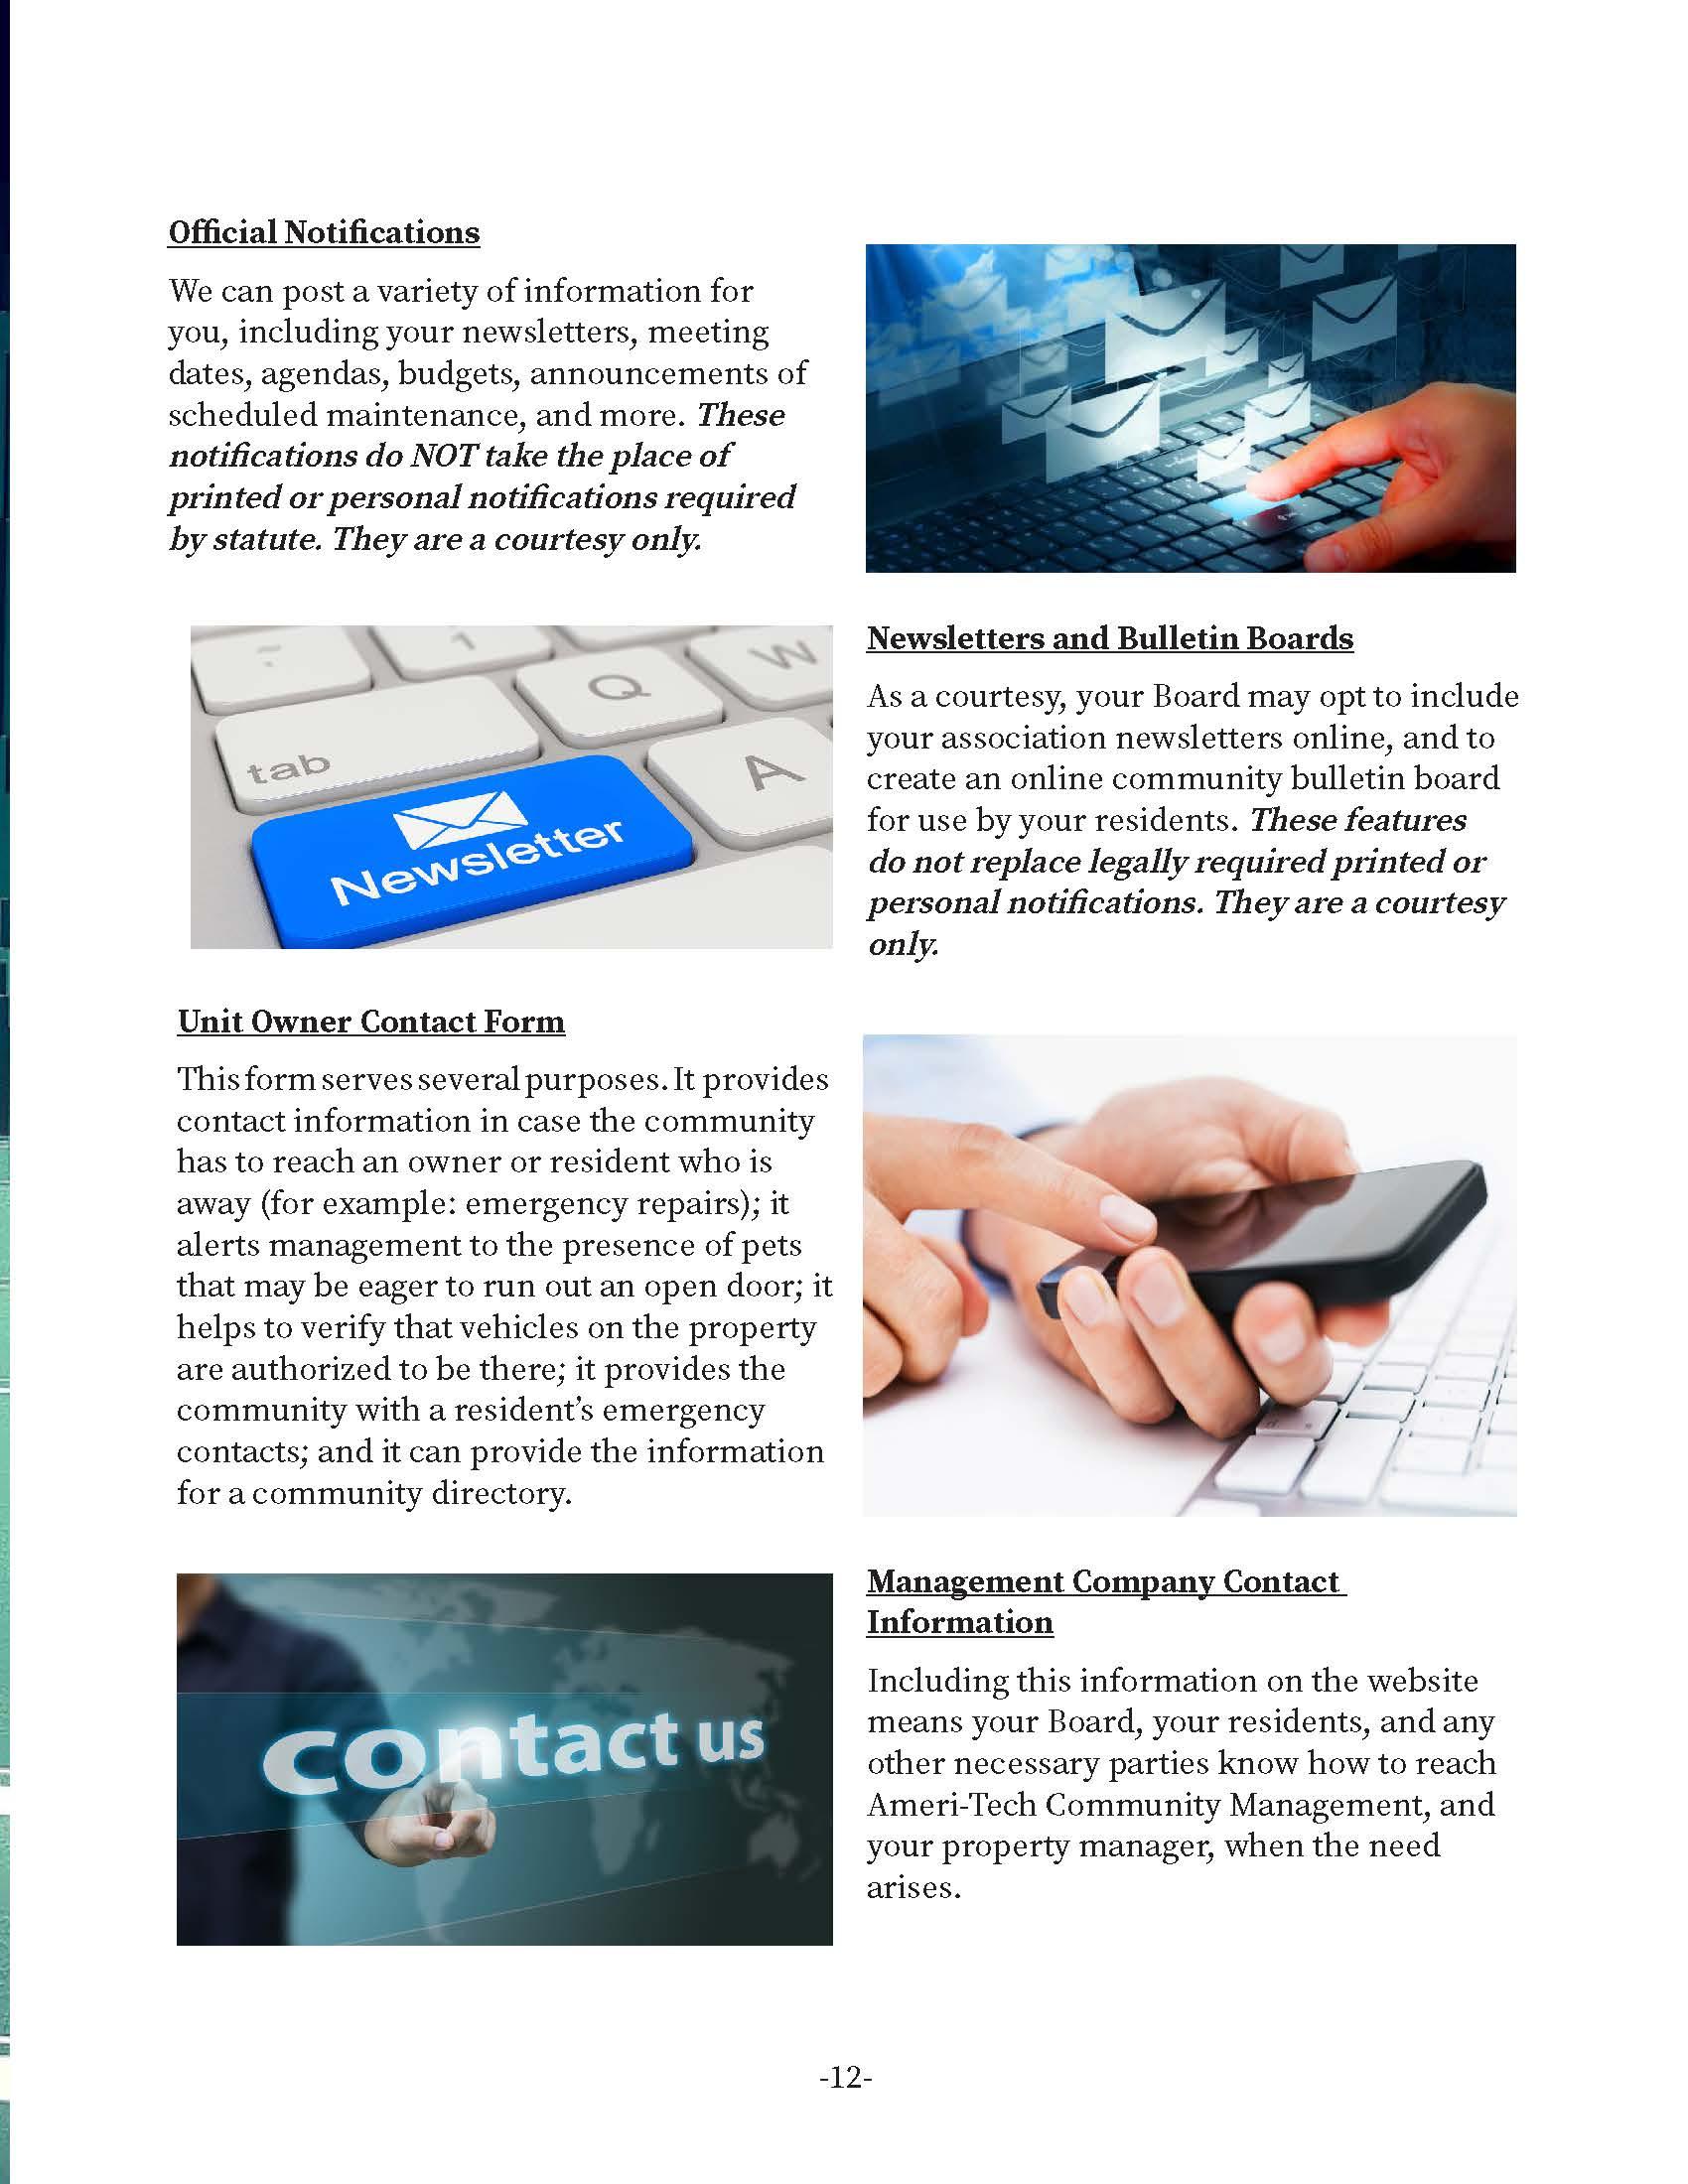 Community Websites Developed by Ameri-Tech